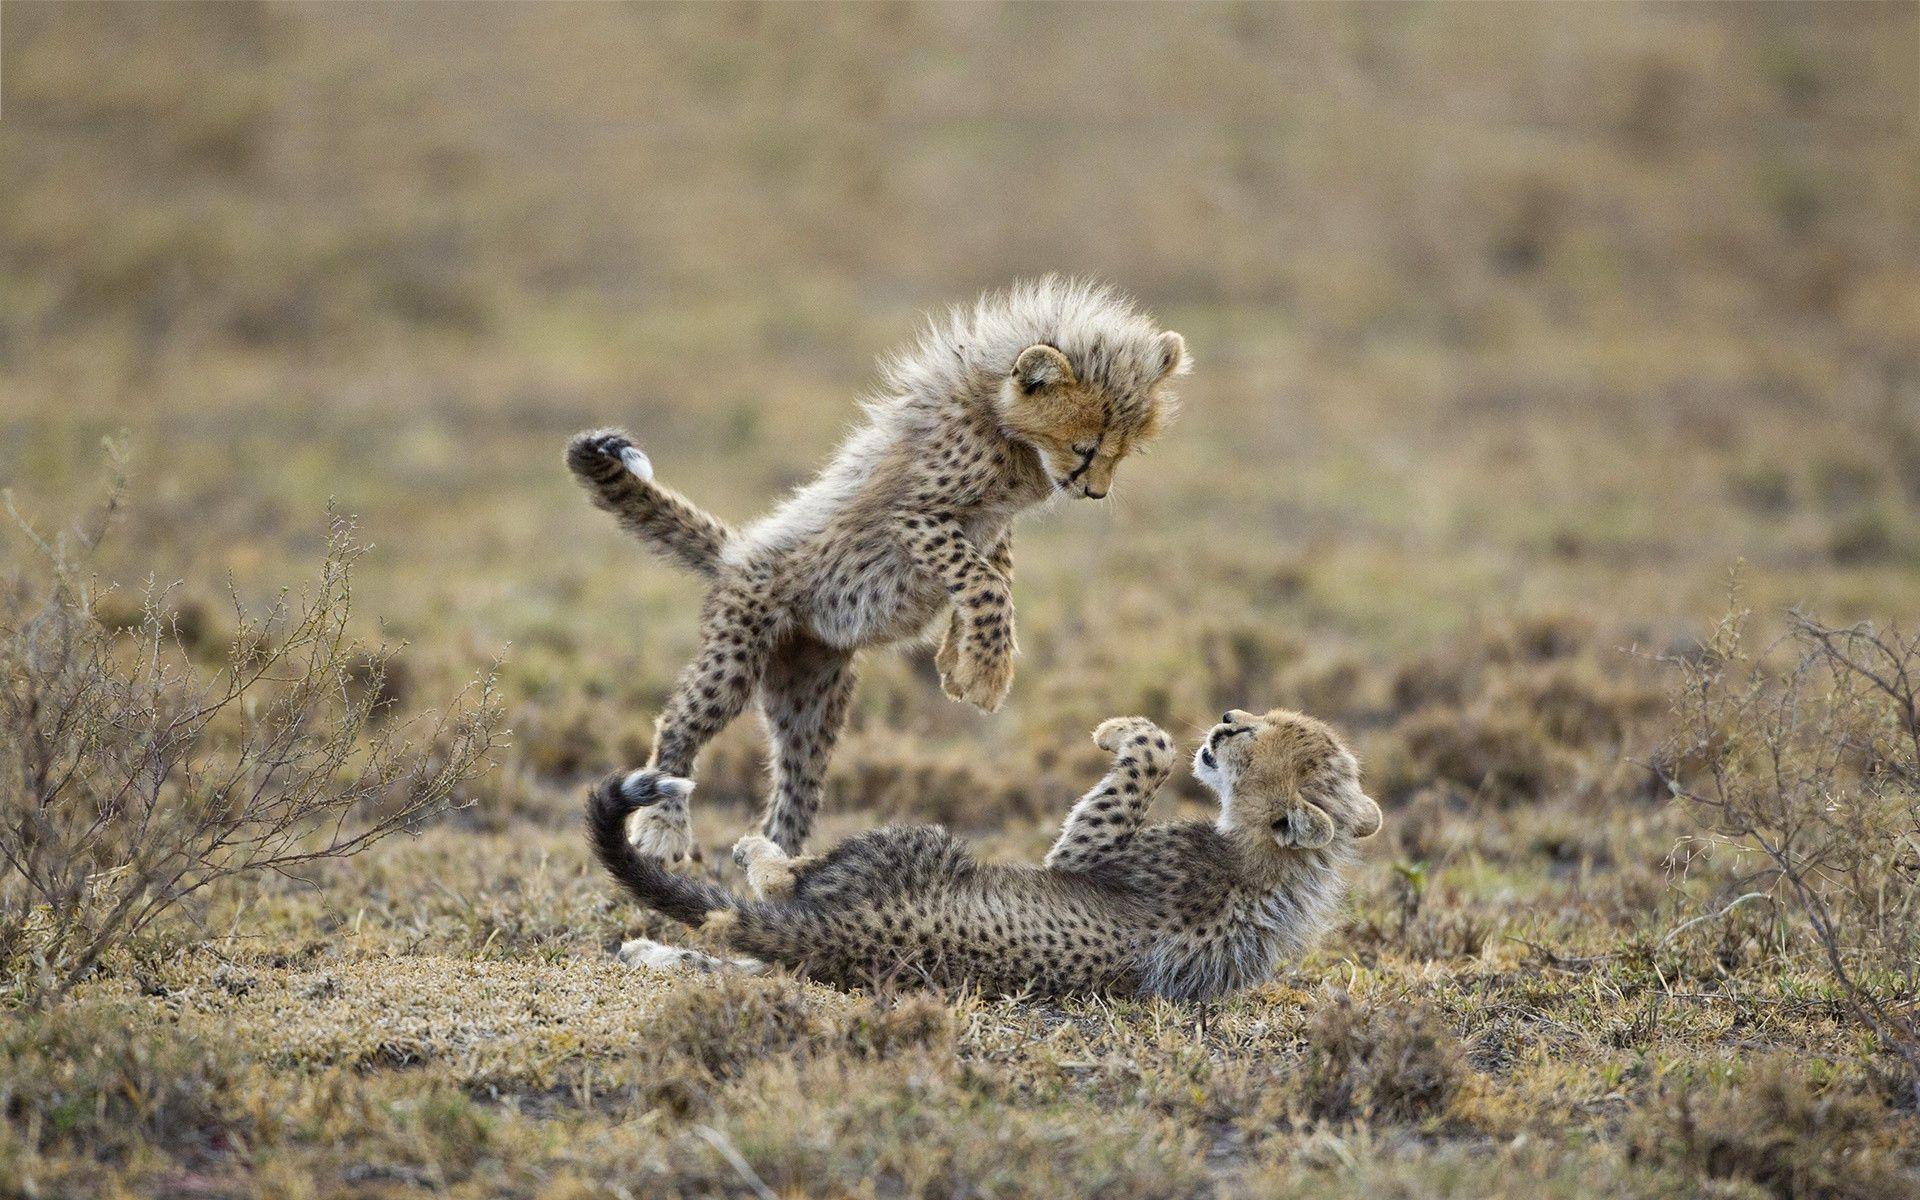 Baby Cheetah Wallpaper Widescreen - Imanoela